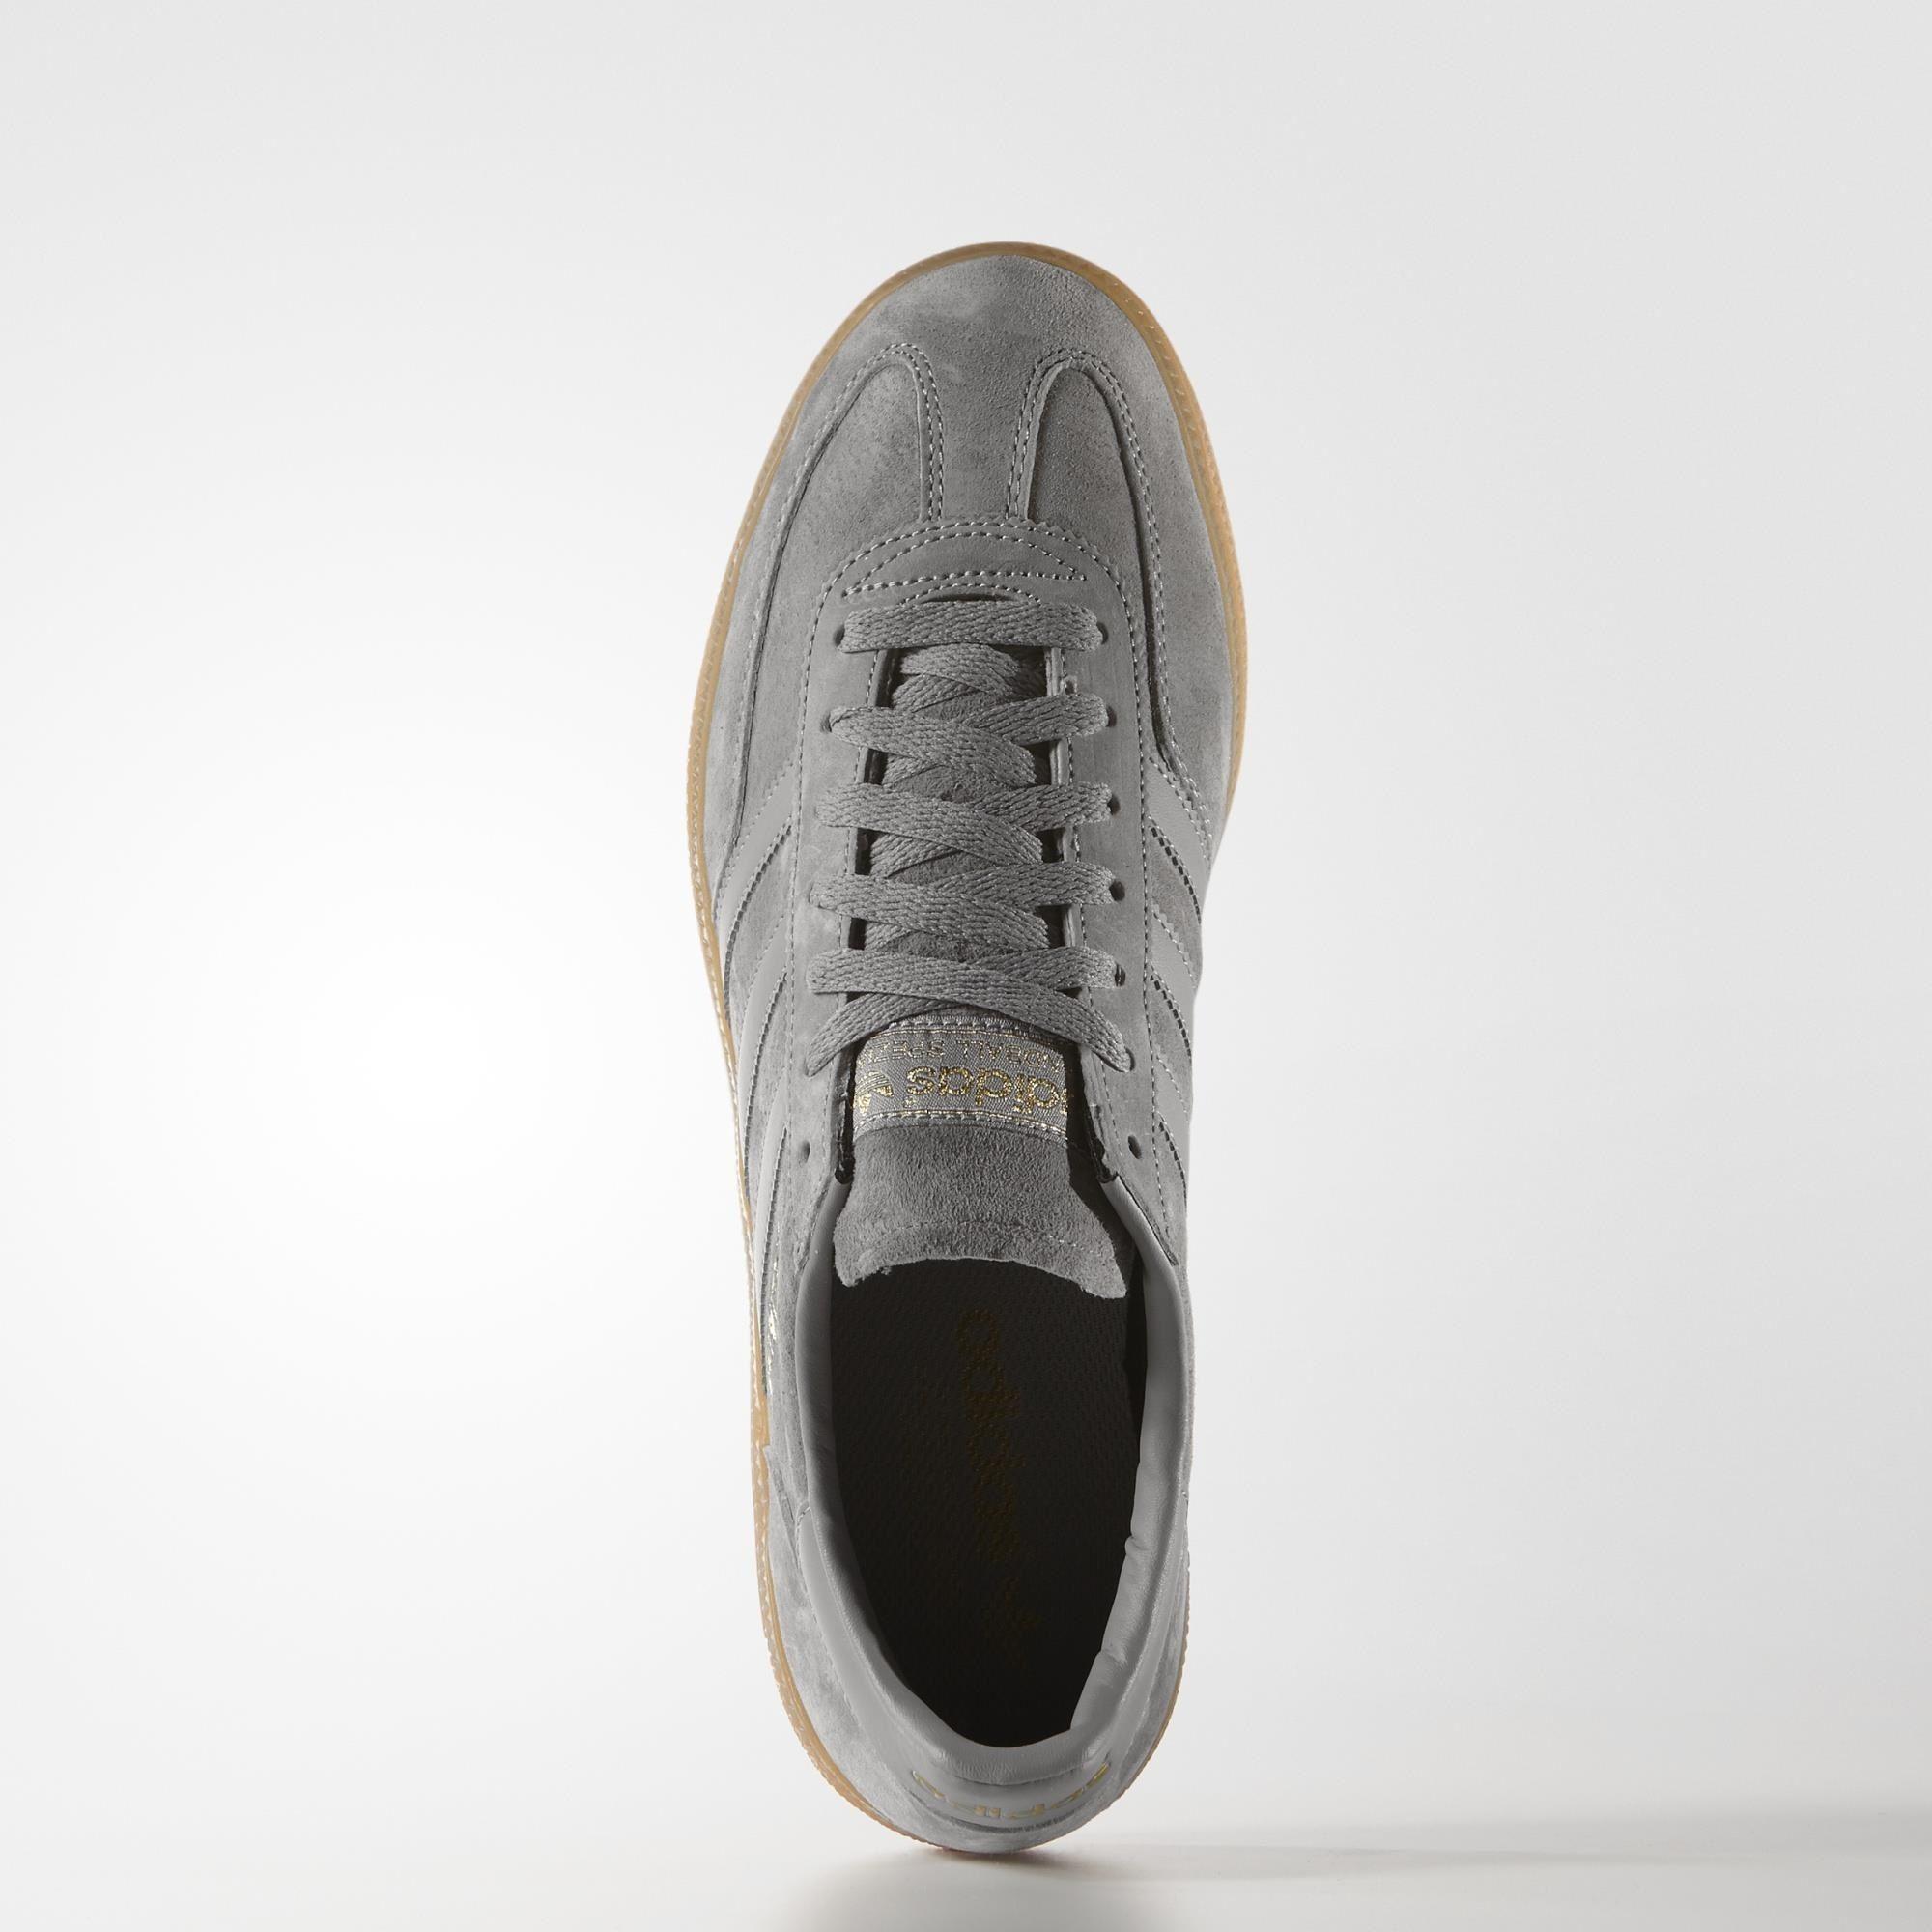 Adidas Buty Spezial Szary Adidas Poland Adidas Spezial Adidas Online Shoes